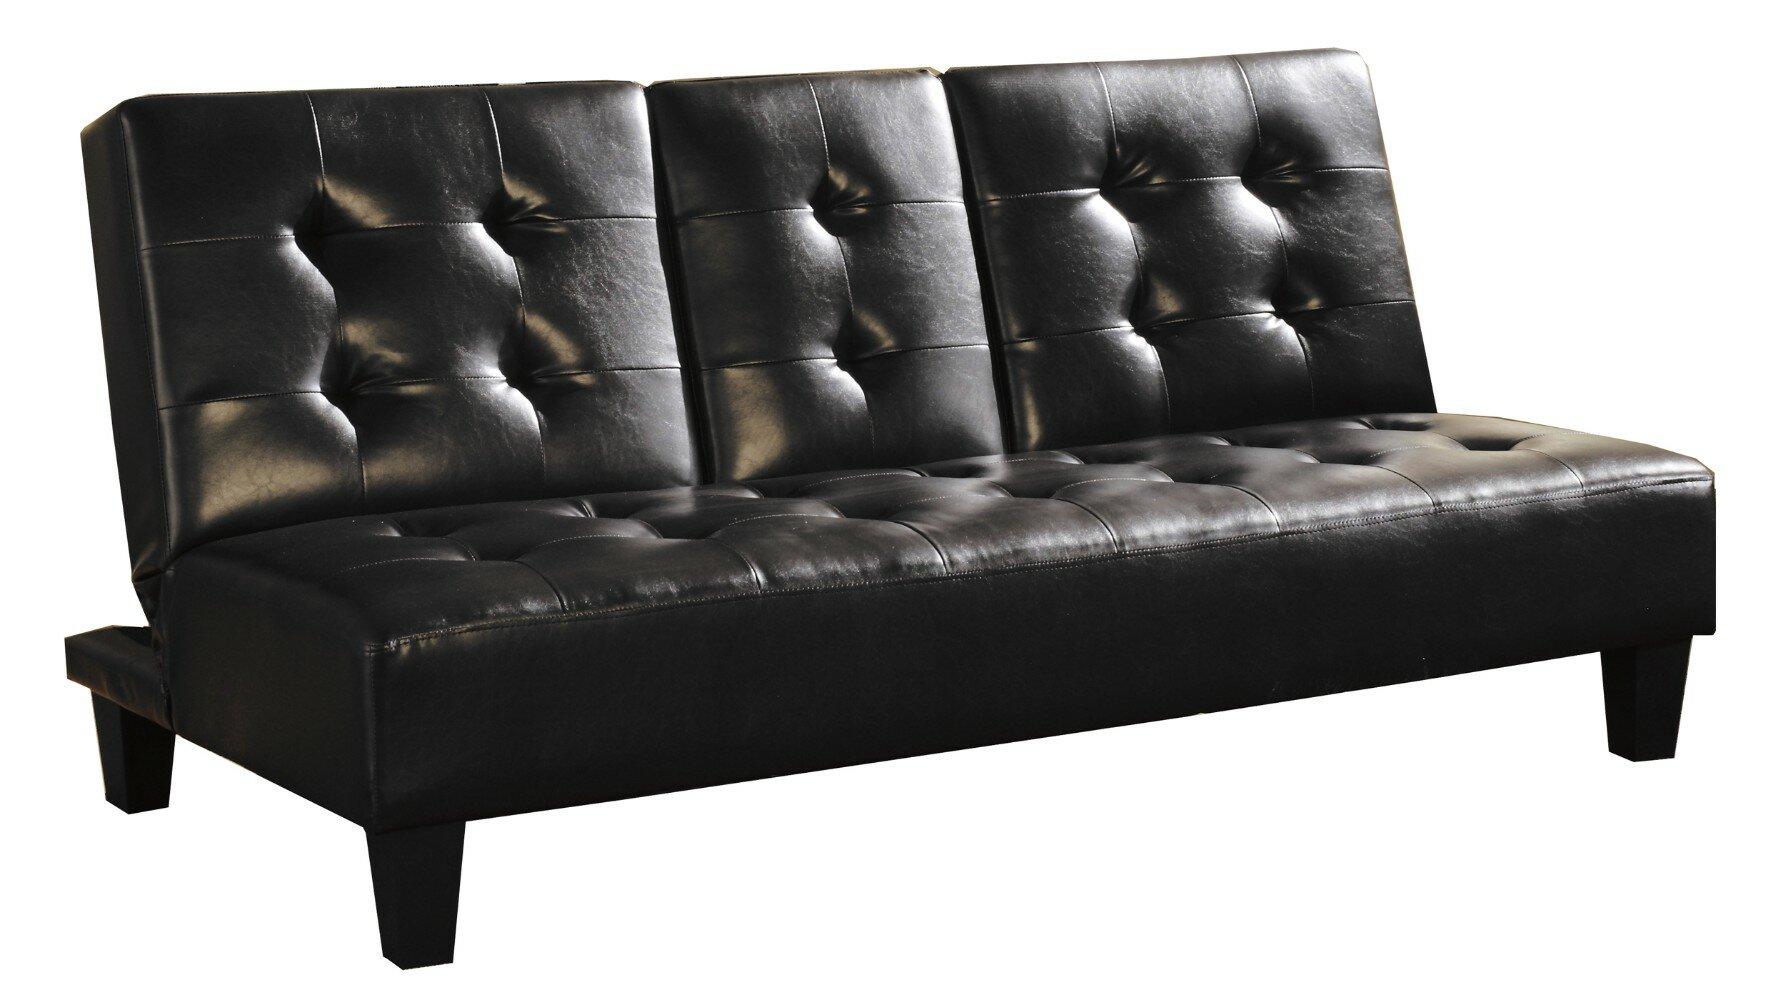 Ebern Designs Fish Faux Leather Upholstered Futon Convertible Sofa Wayfair